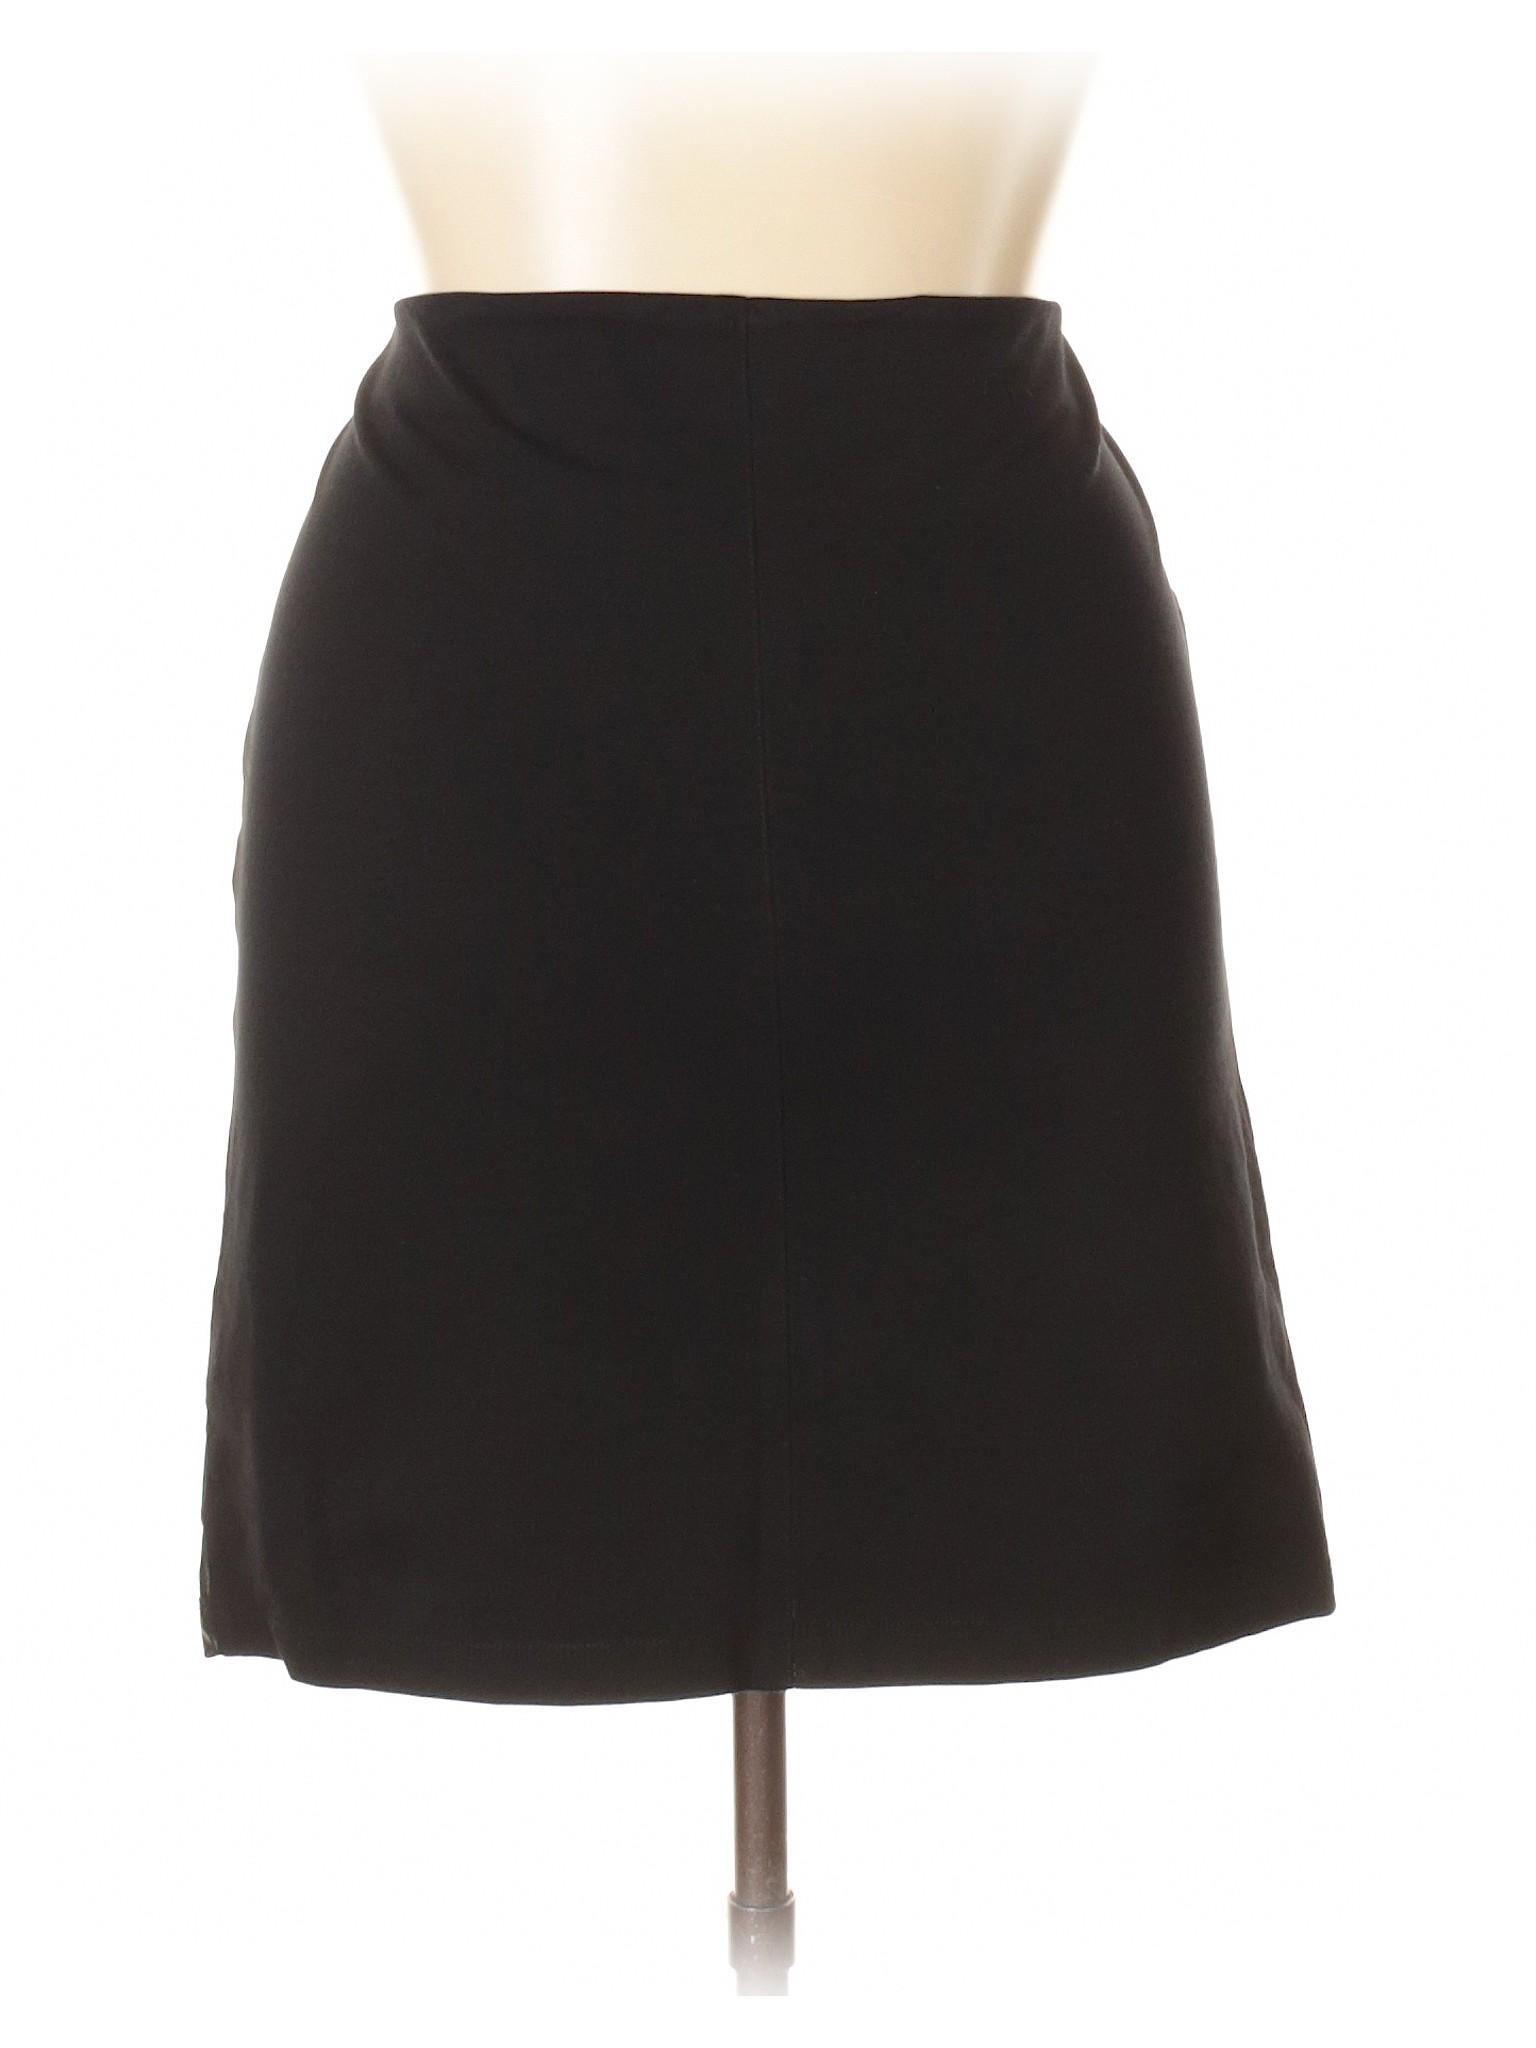 Casual Boutique Kane Skirt Karen leisure UtfrqtSnx